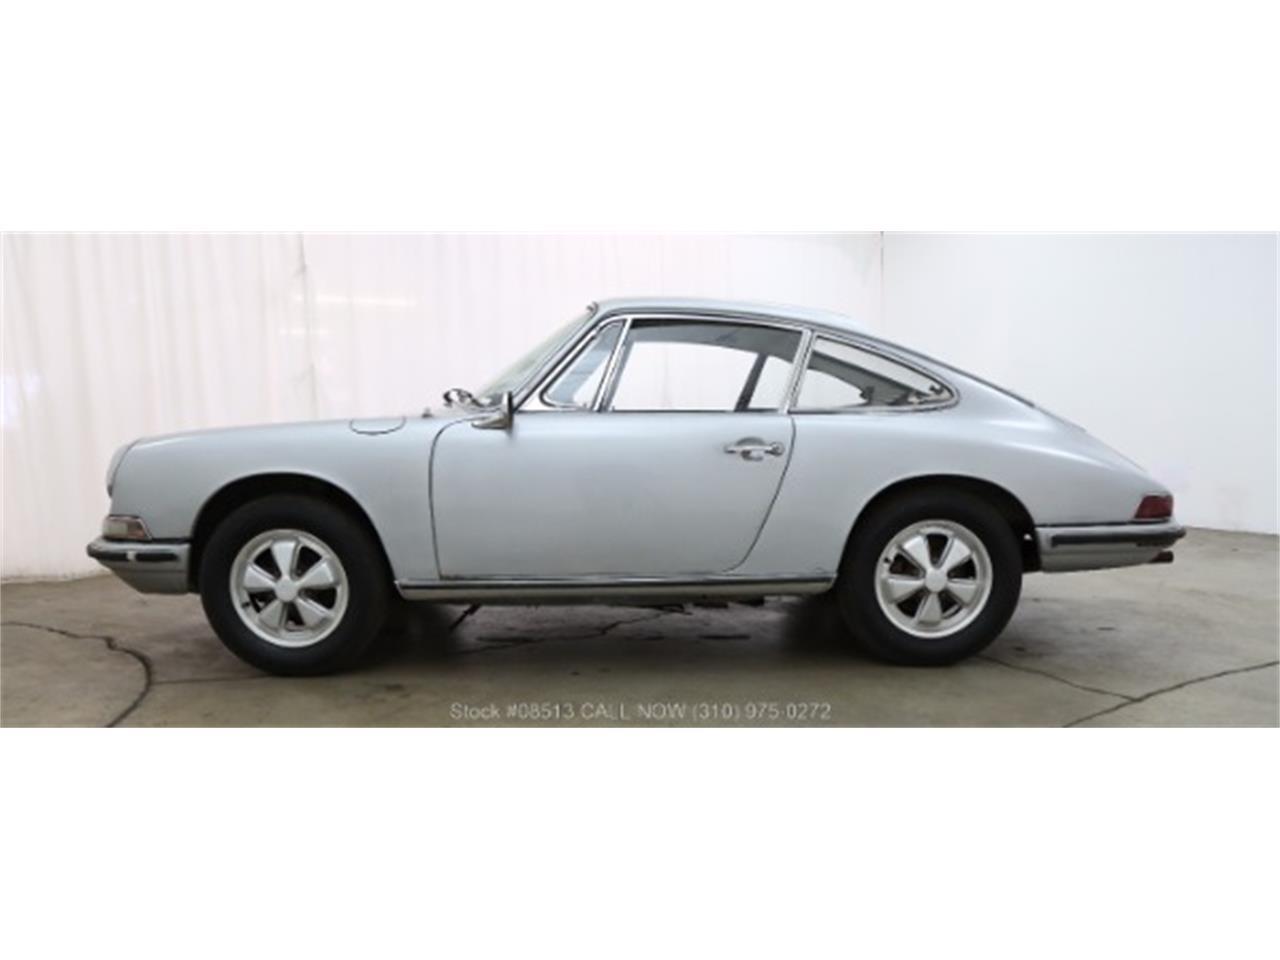 Large Picture of Classic 1967 Porsche 912 located in California - $19,750.00 - LFUN